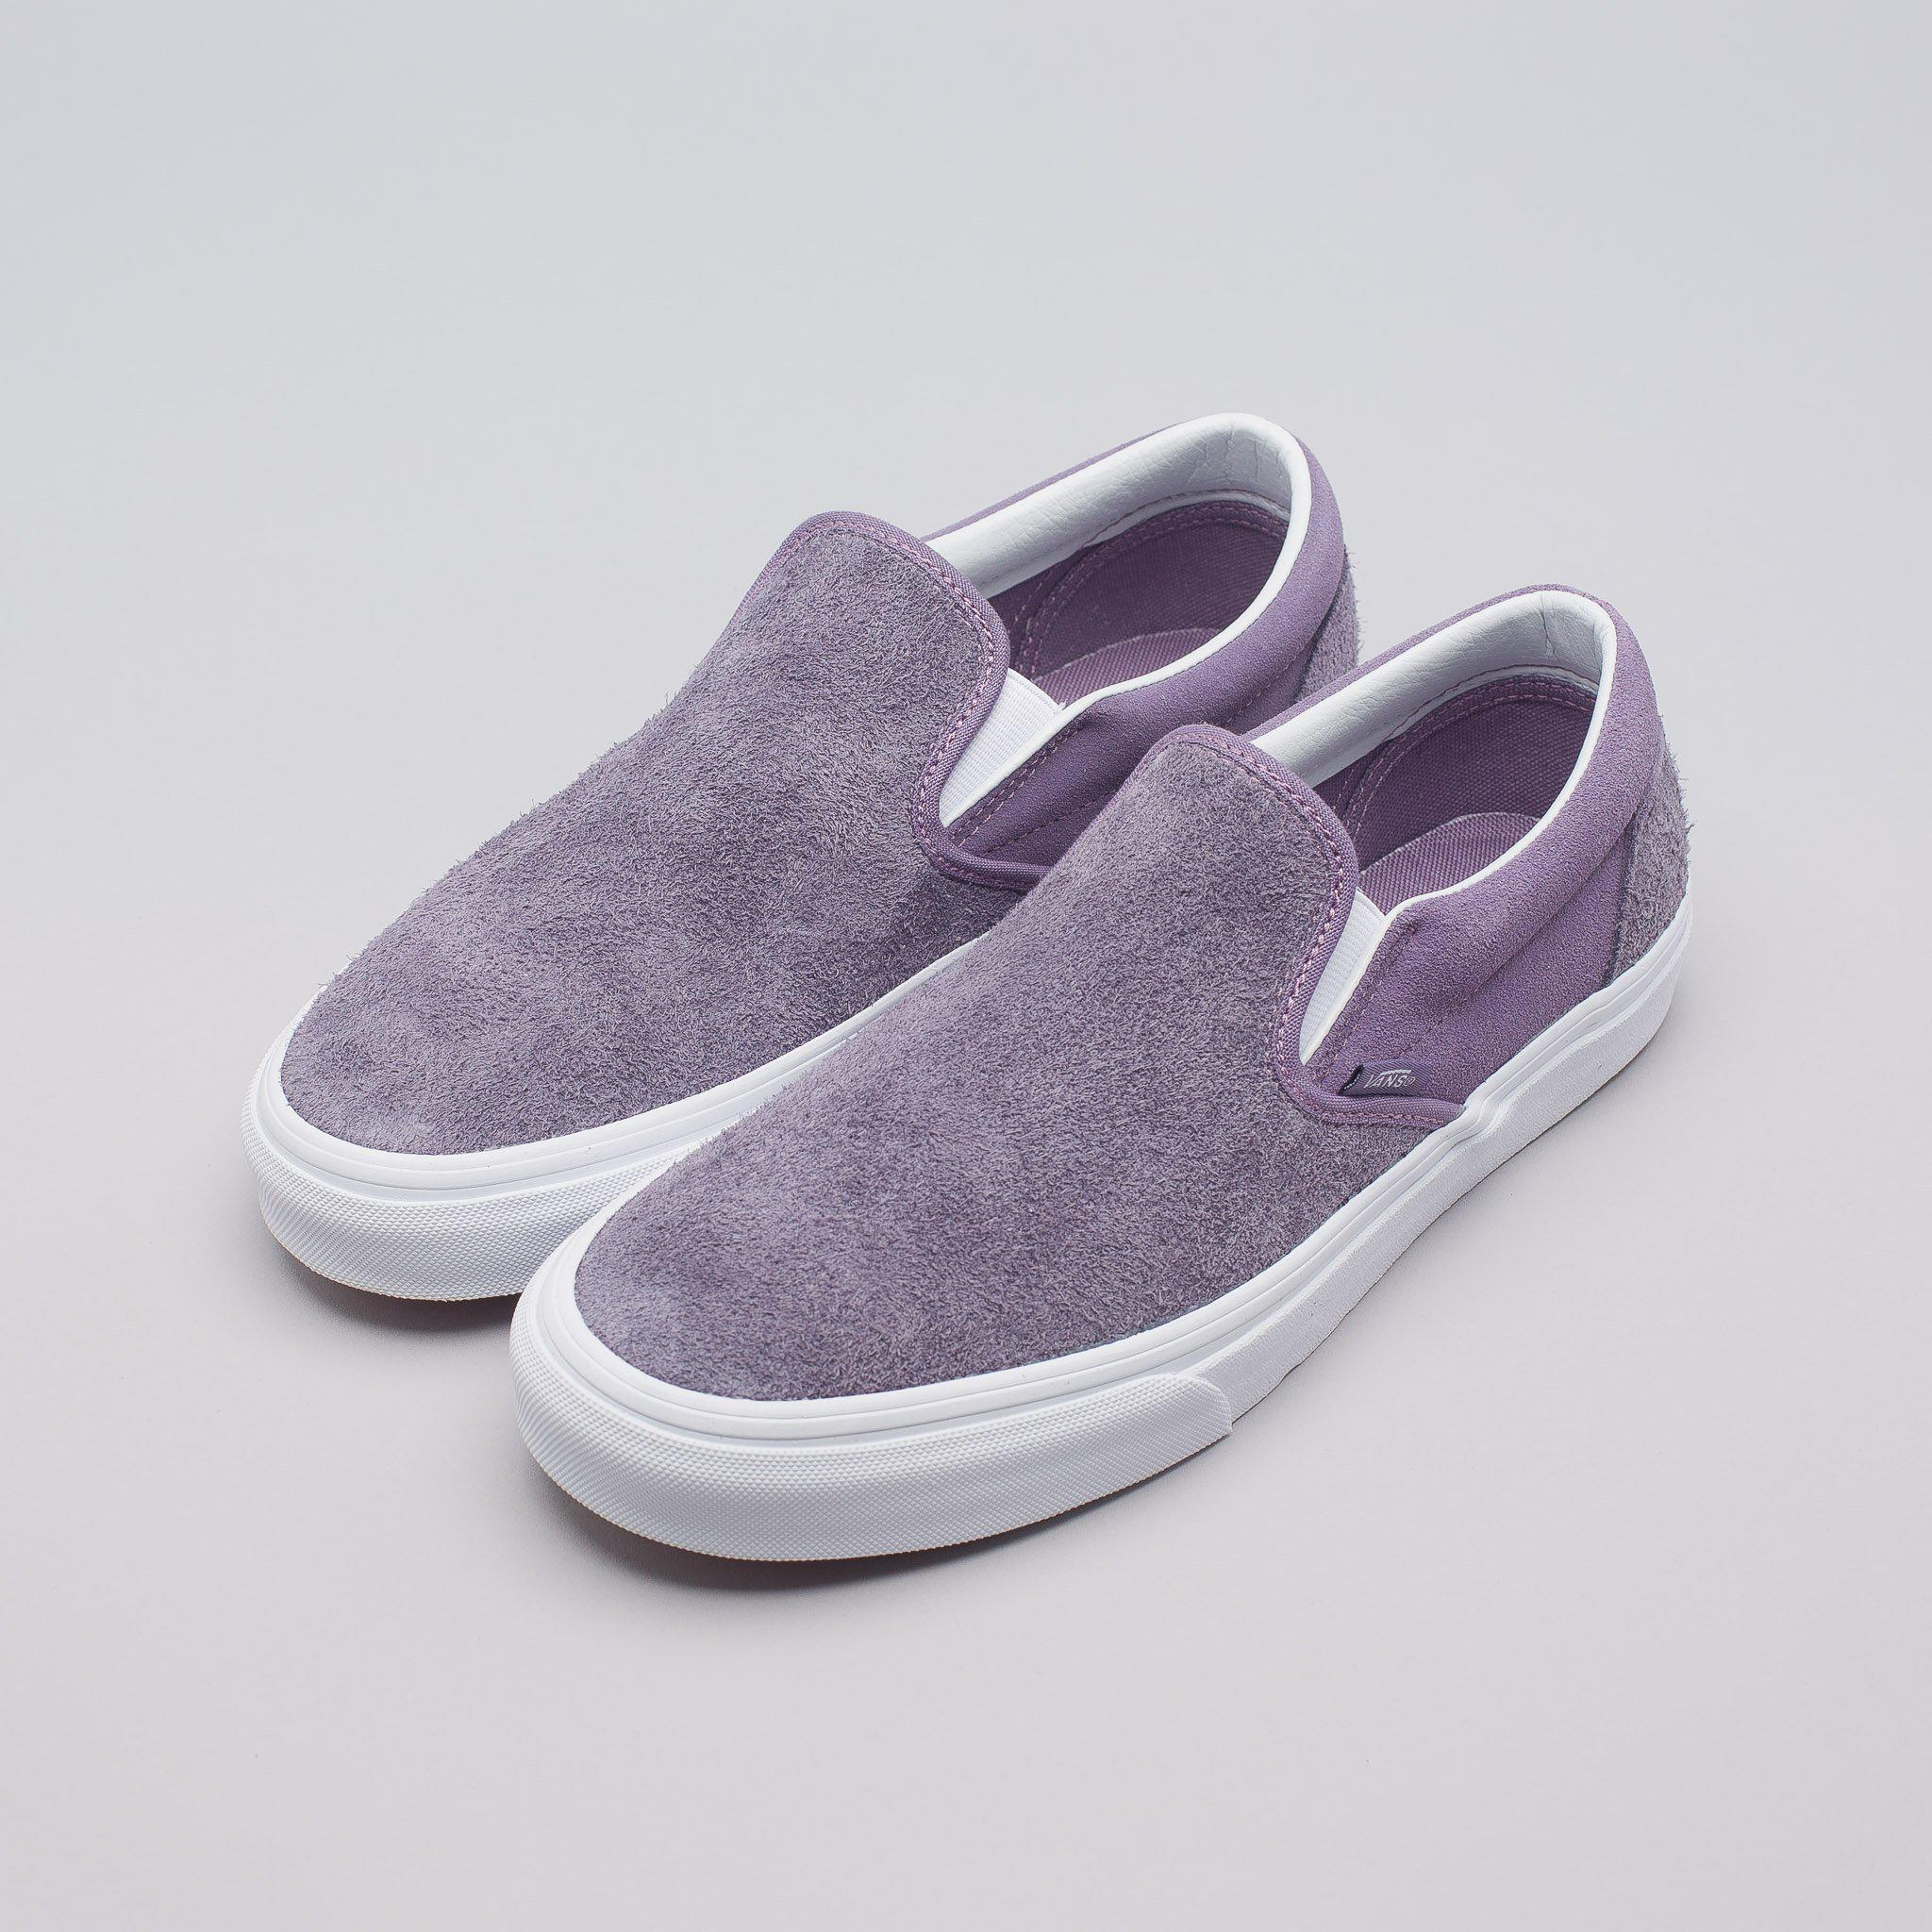 434ea93021c96a Lyst - Vans Classic Slip-on In Purple Hairy Suede in Purple for Men